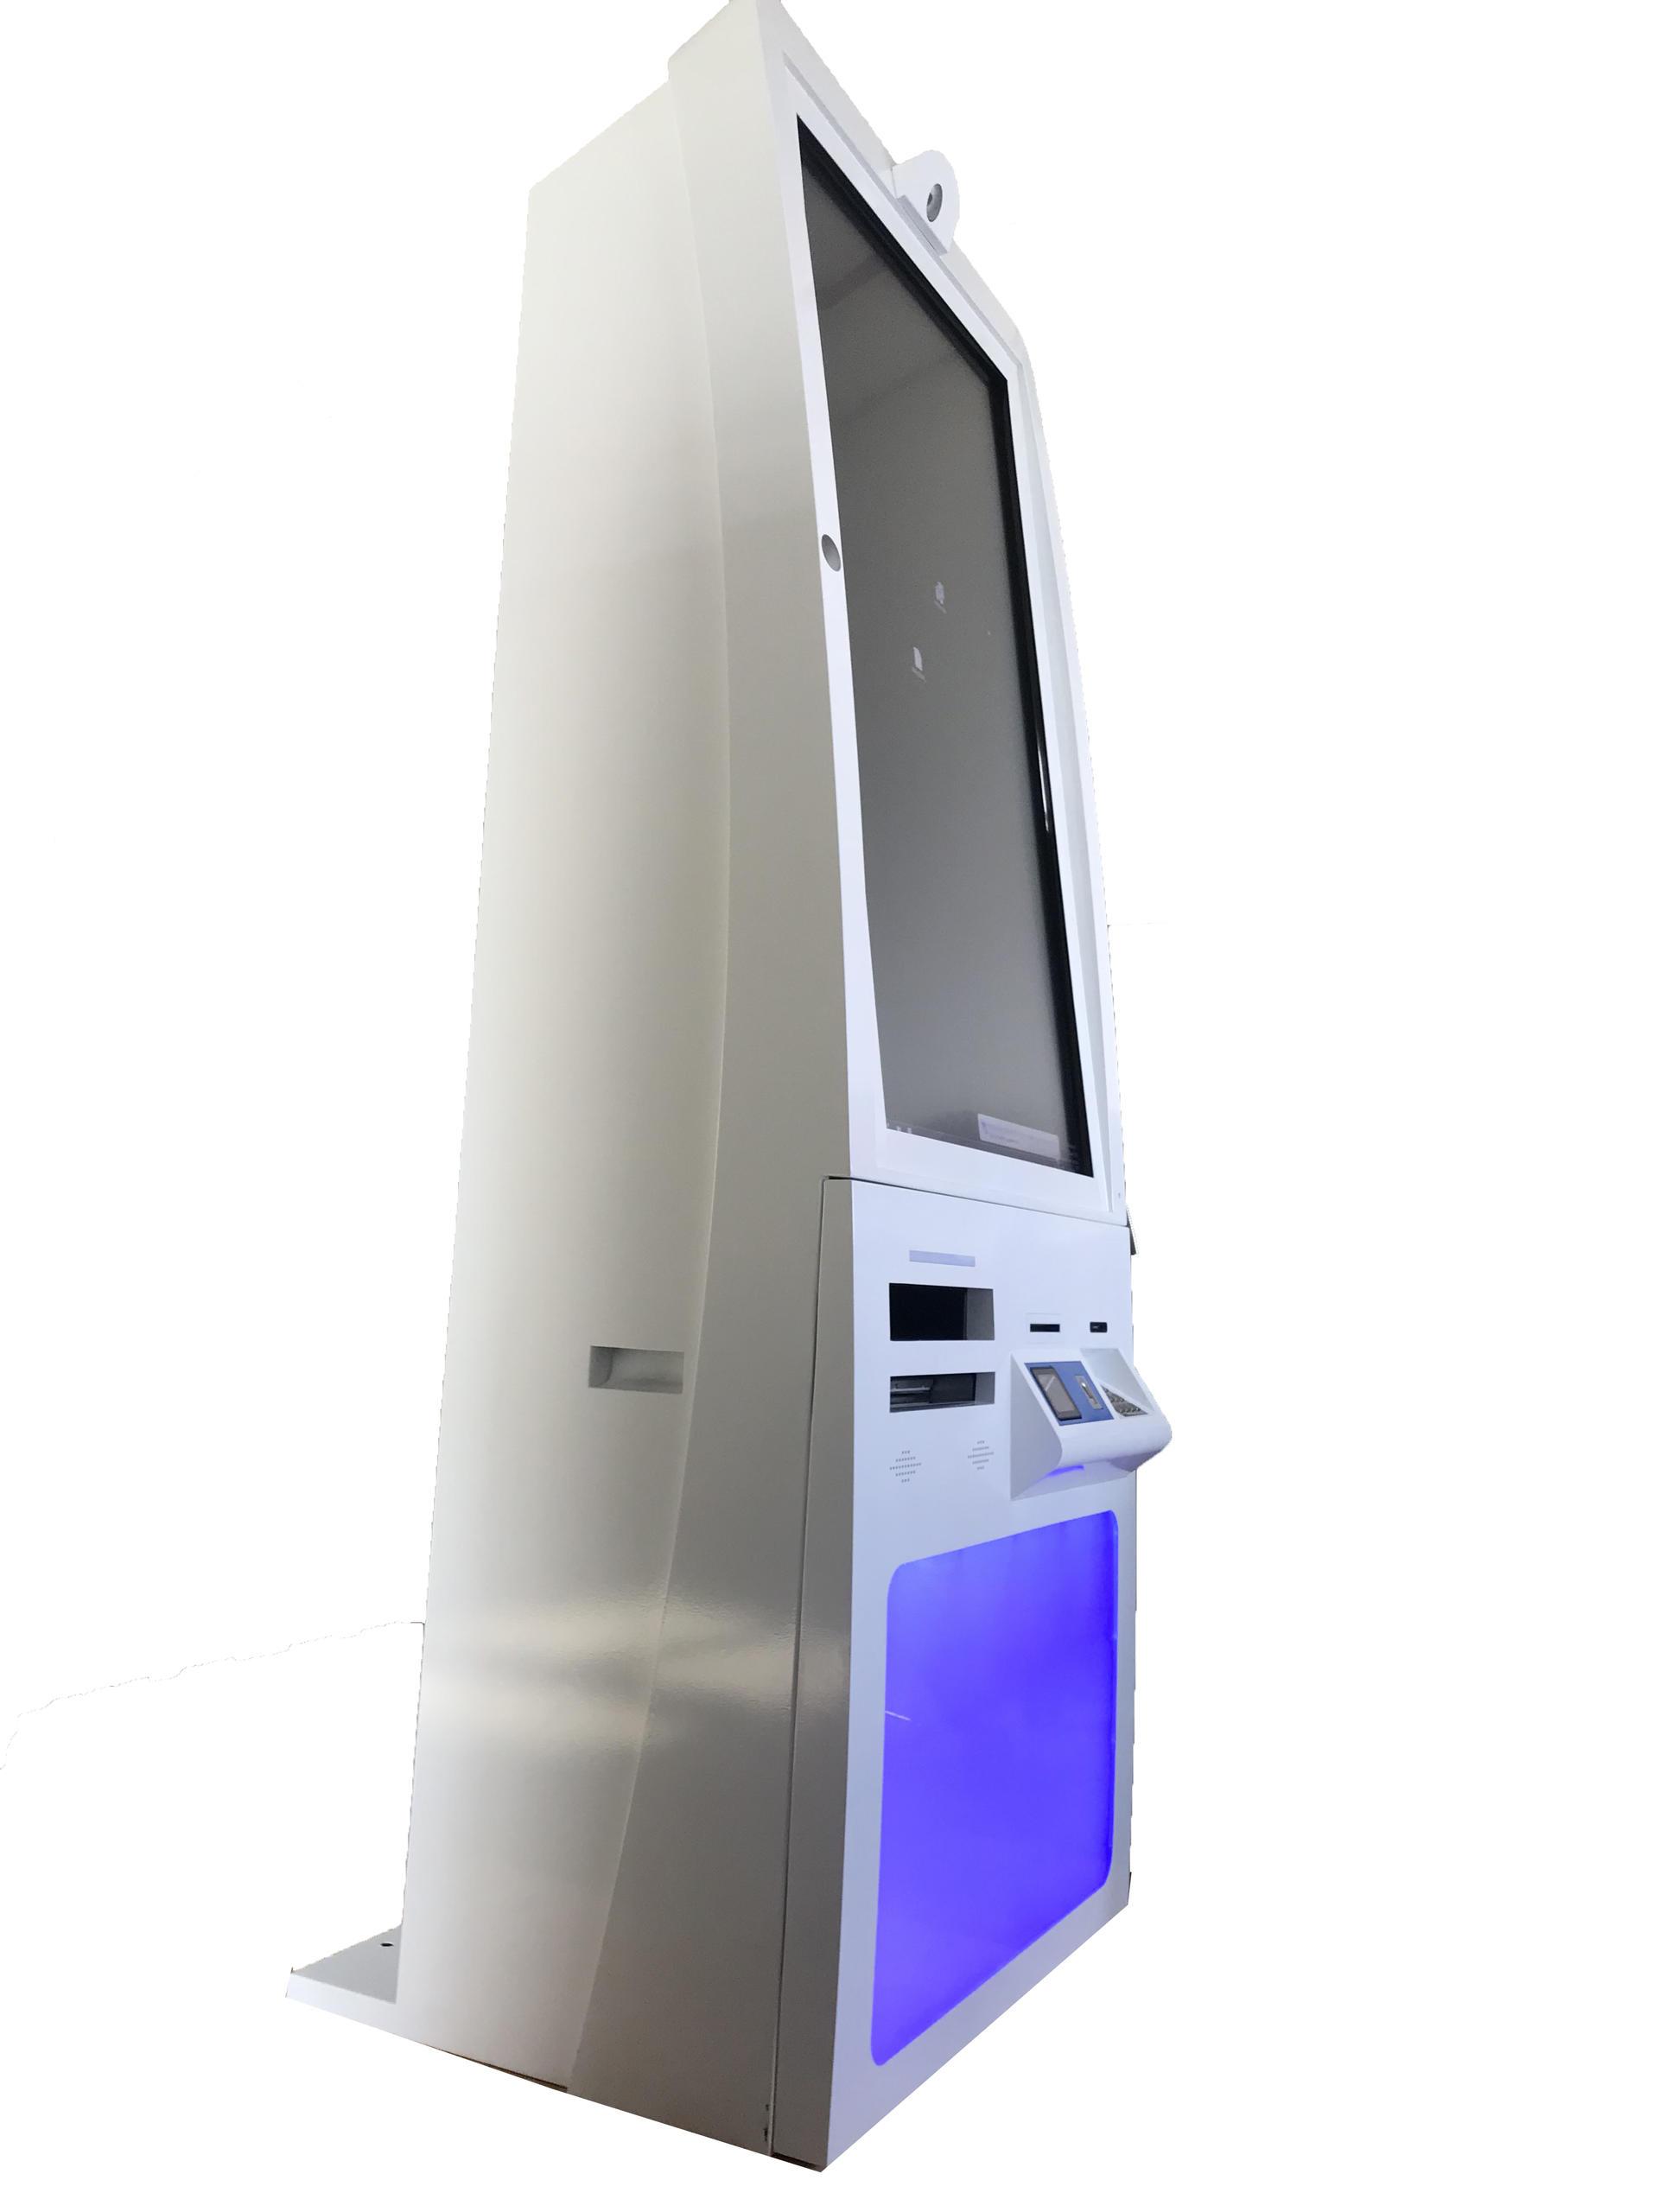 Customized Self Service Report Printing kiosk With Printer